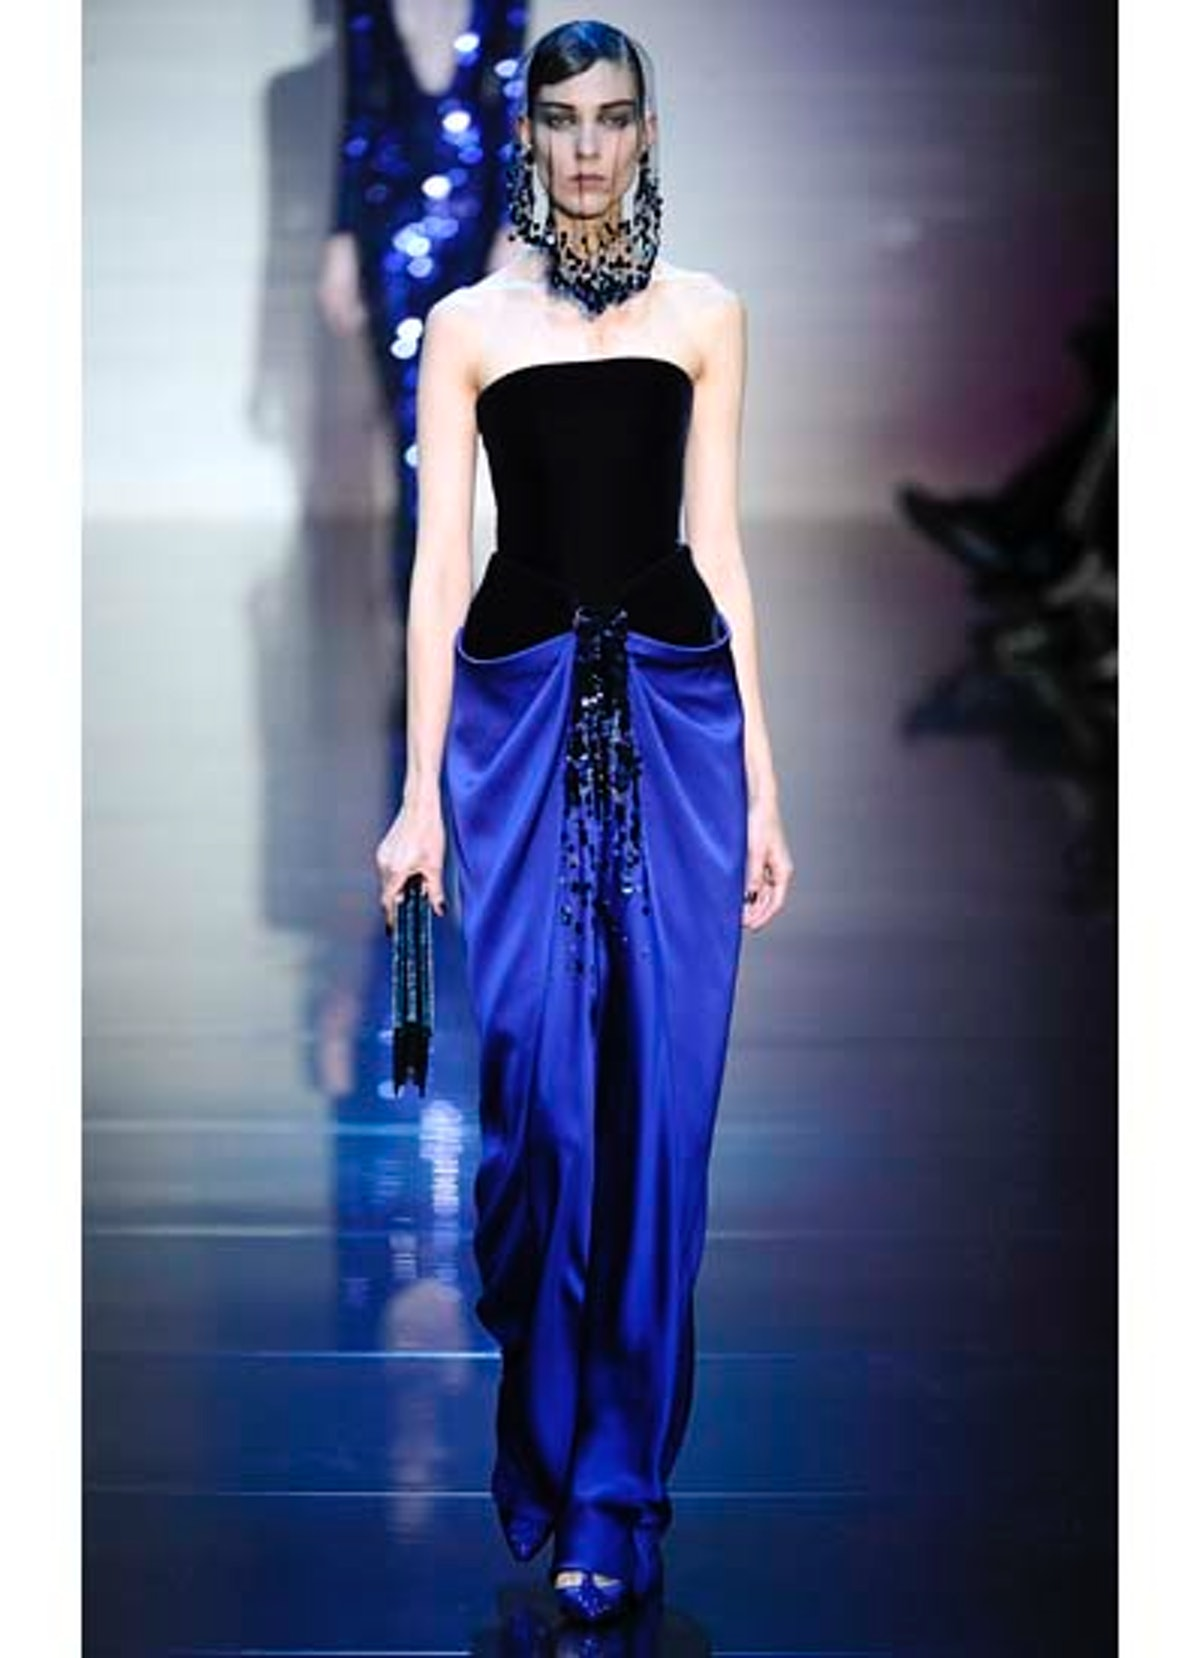 fass-giorgio-armani-couture-2012-runway-36-v.jpg